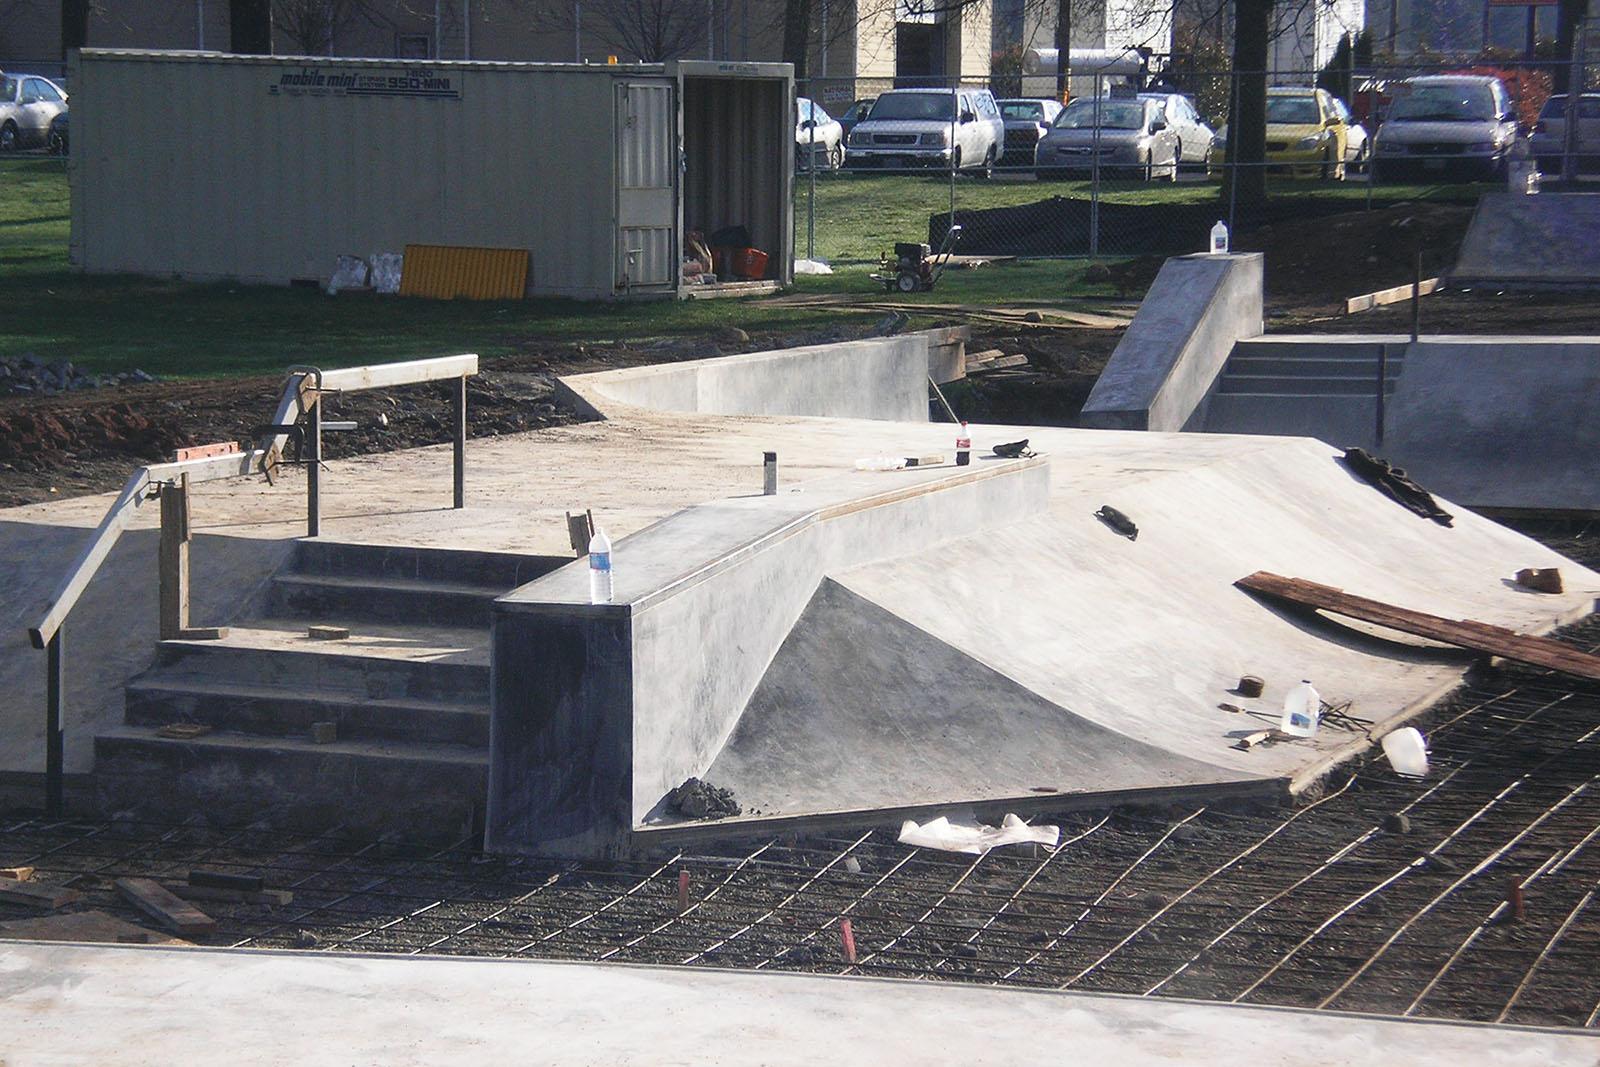 Several street skating inspired features emerge at Glenhaven Skatepark under the design and construction of Dreamland Skateparks